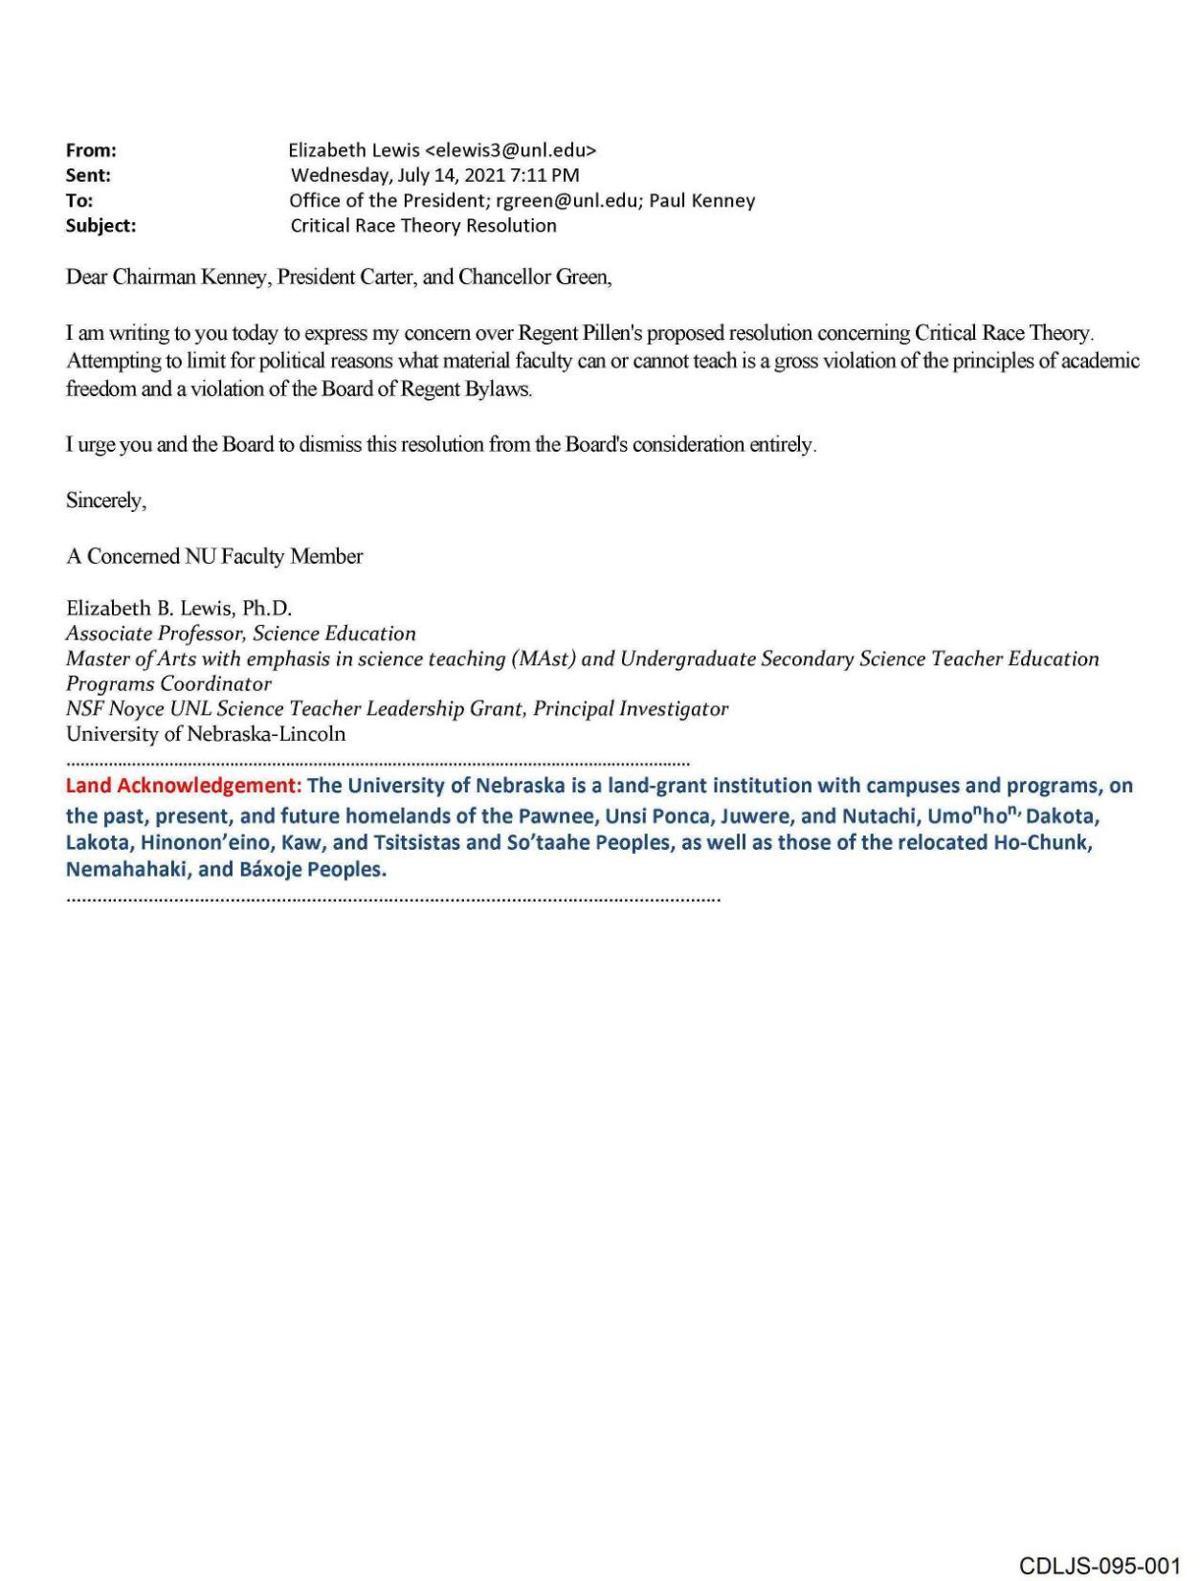 CDLJS-095-001.pdf